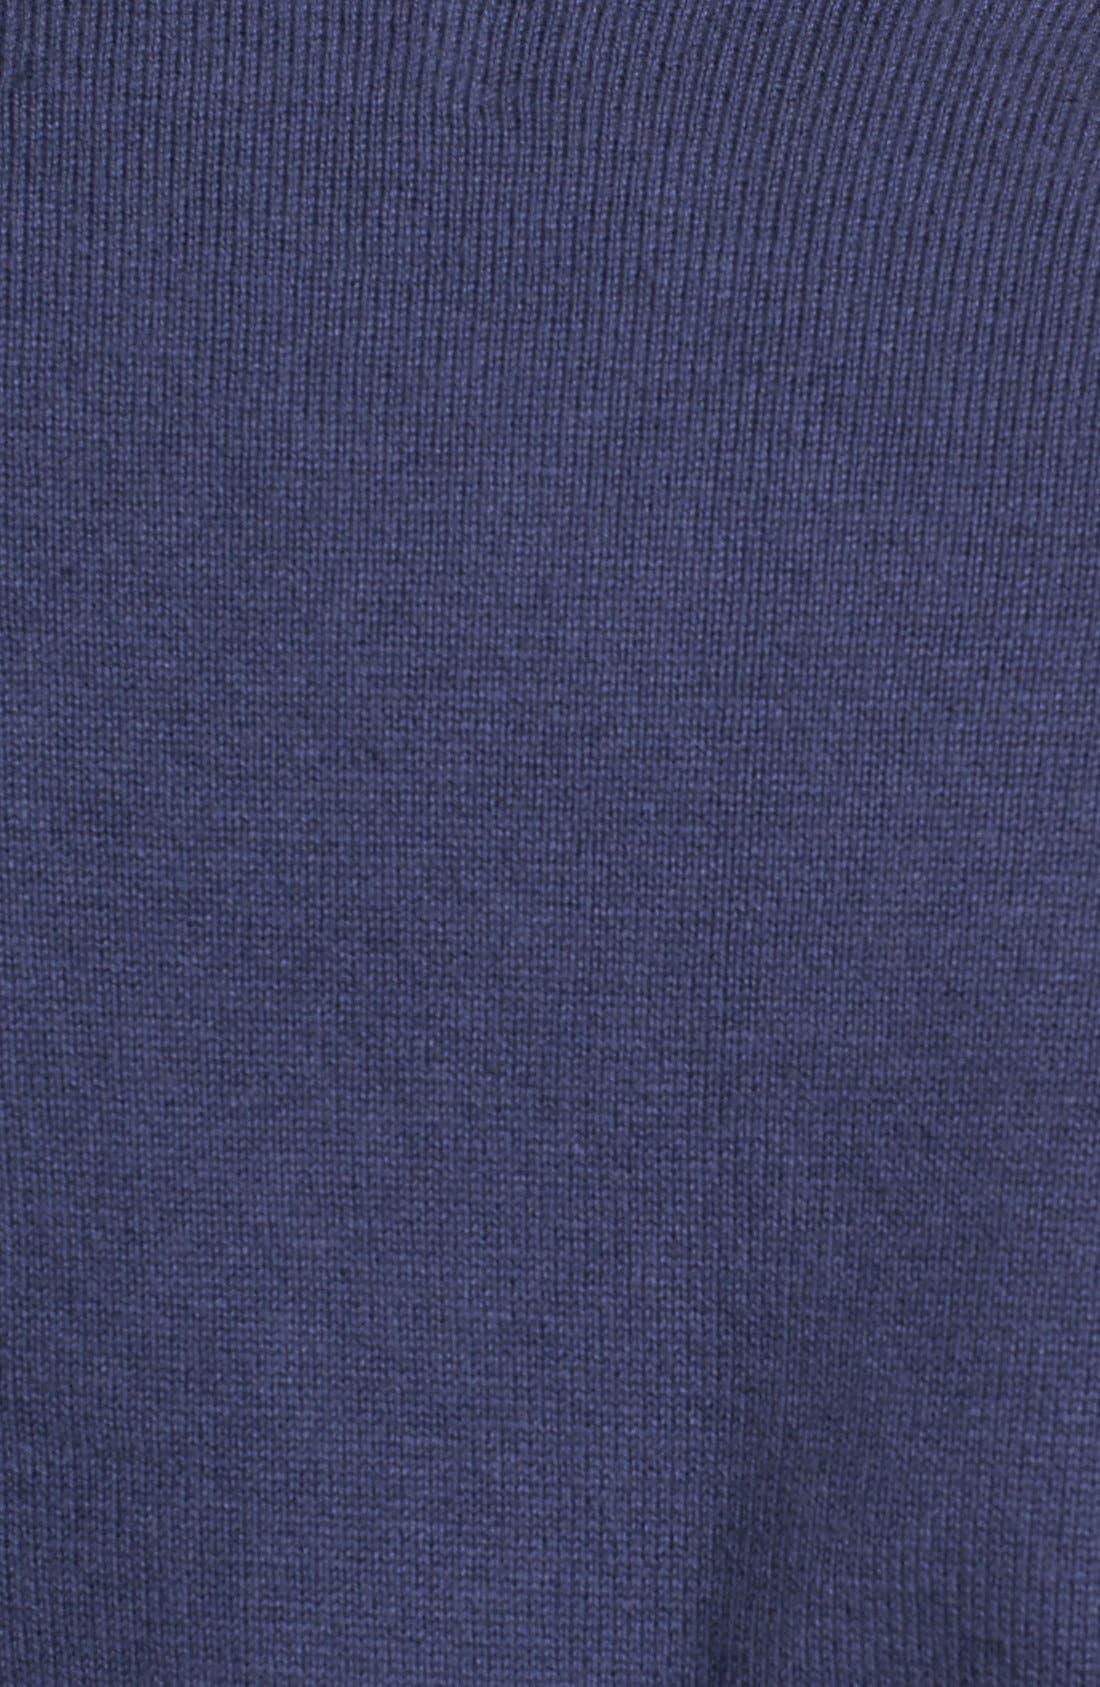 Alternate Image 3  - Wallin & Bros. Trim Fit V-Neck Cotton & Cashmere Sweater